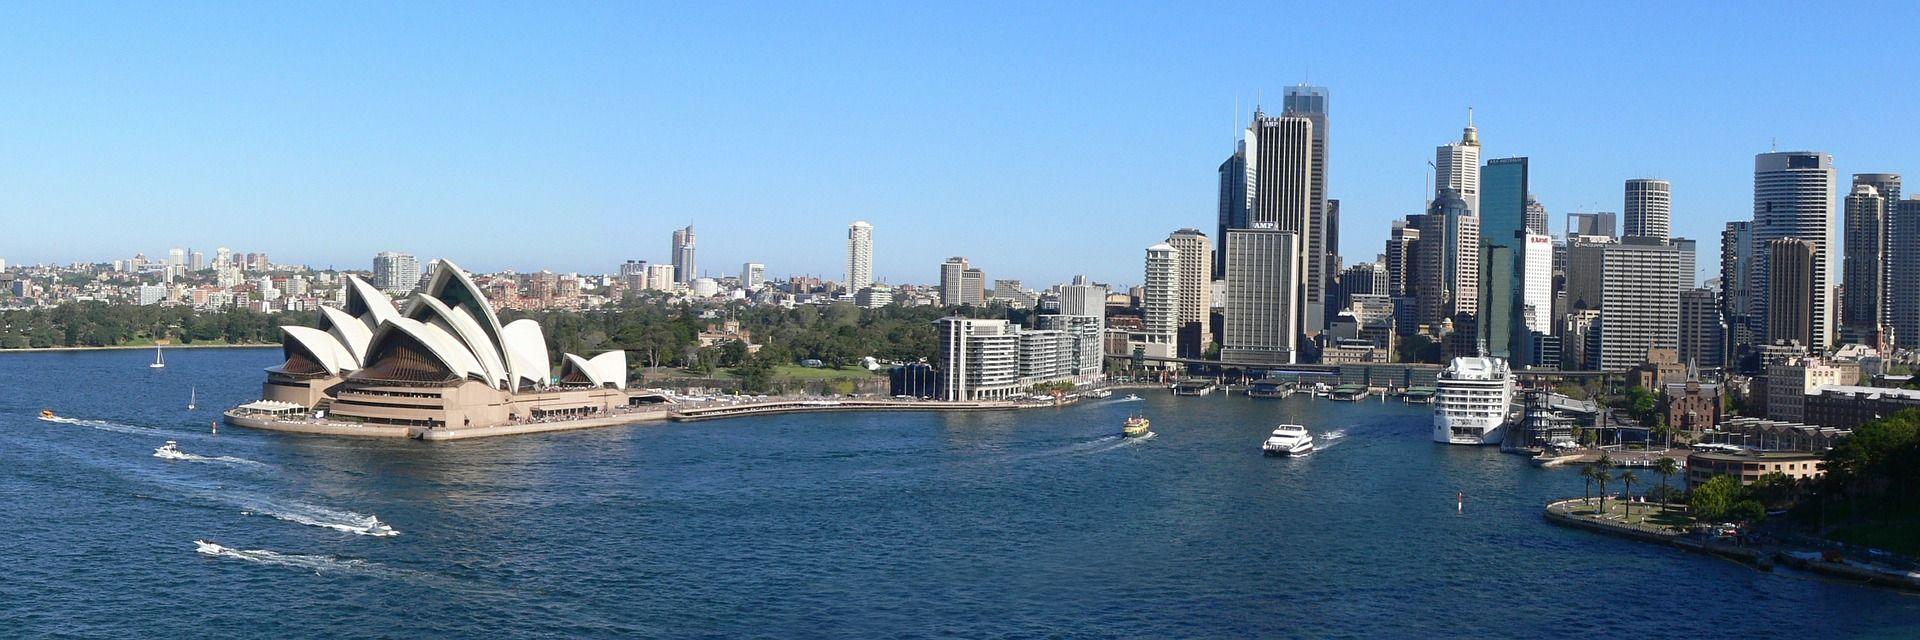 Australian FinTech revenue to exceed A4 billion (2.93